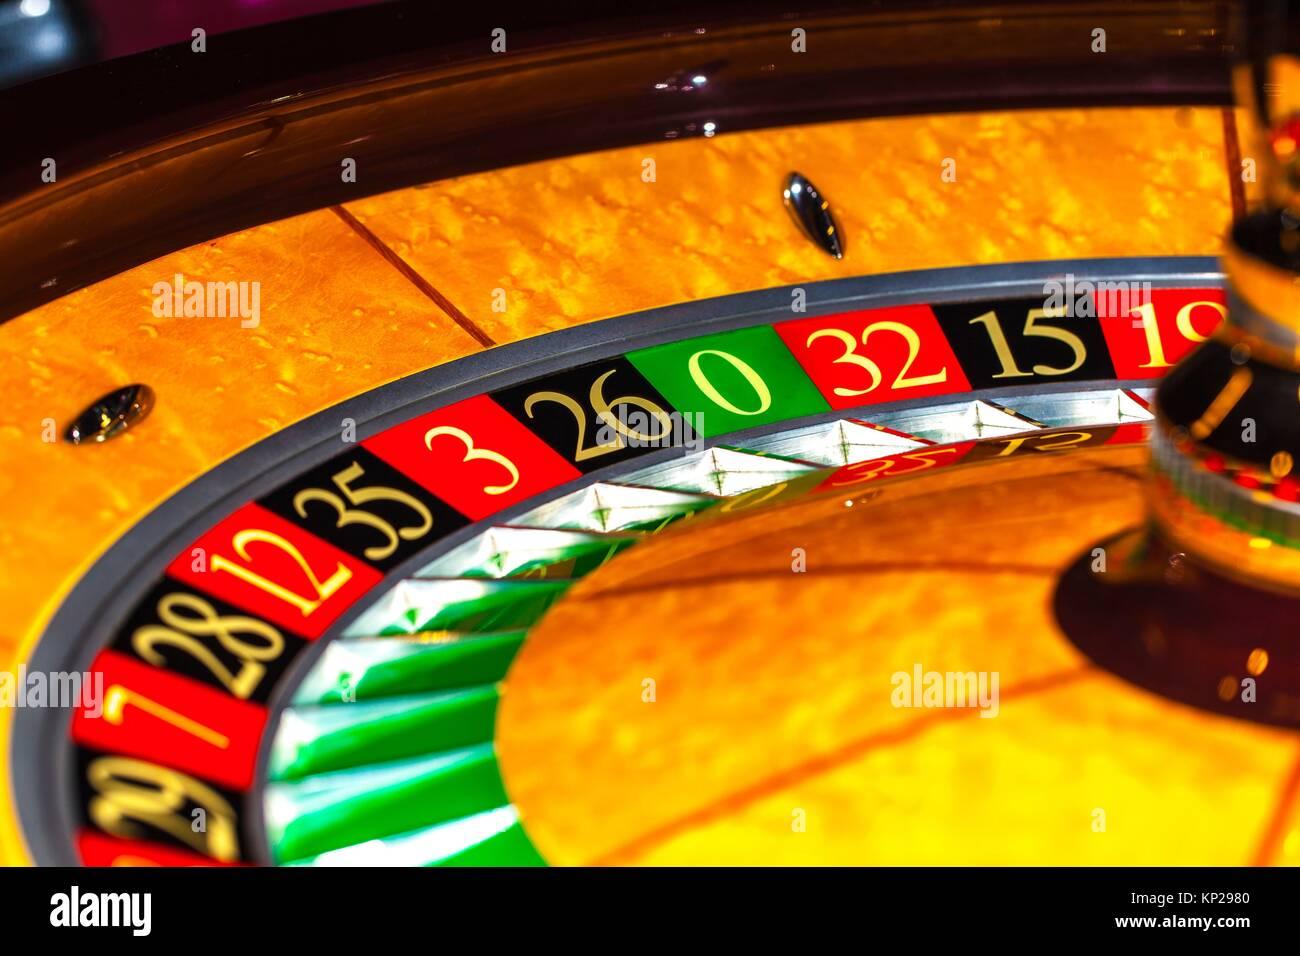 casino gaming club - Stock Image